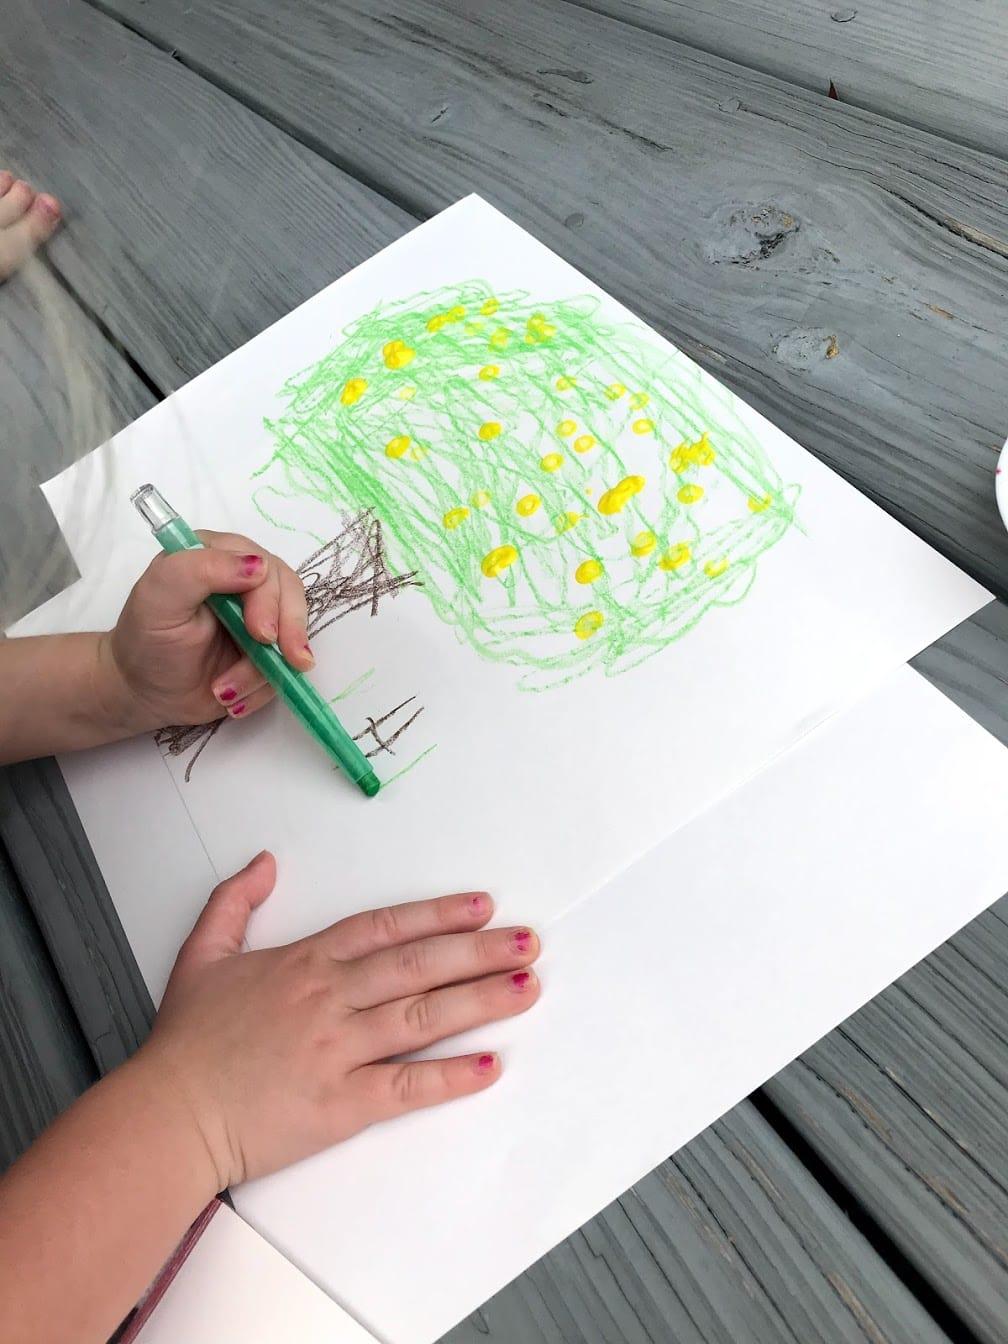 child signing name on artwork